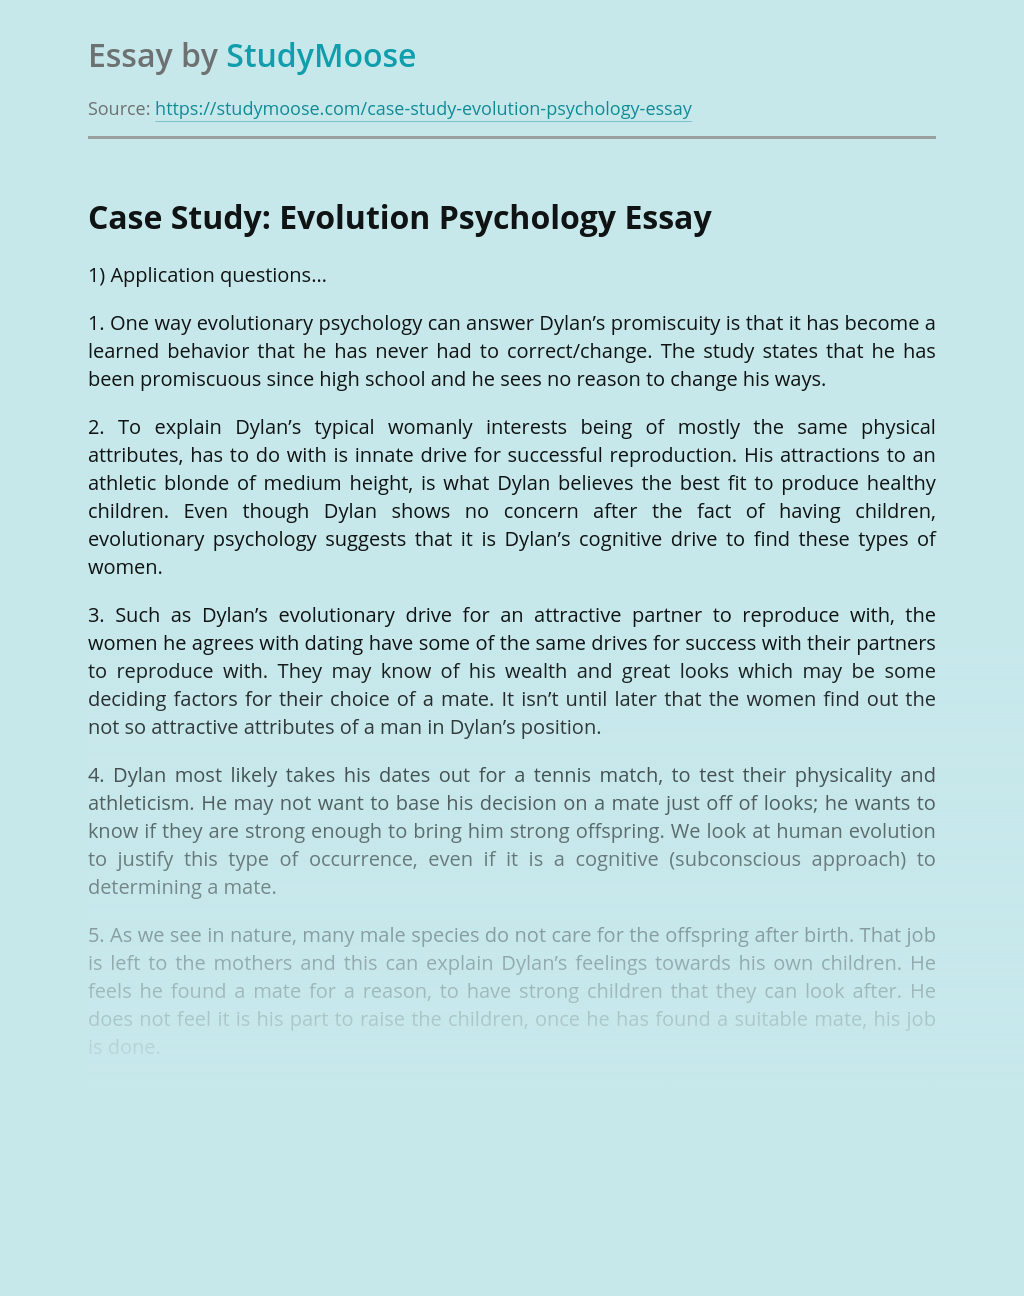 Psychology case study essays proper heading for college essay